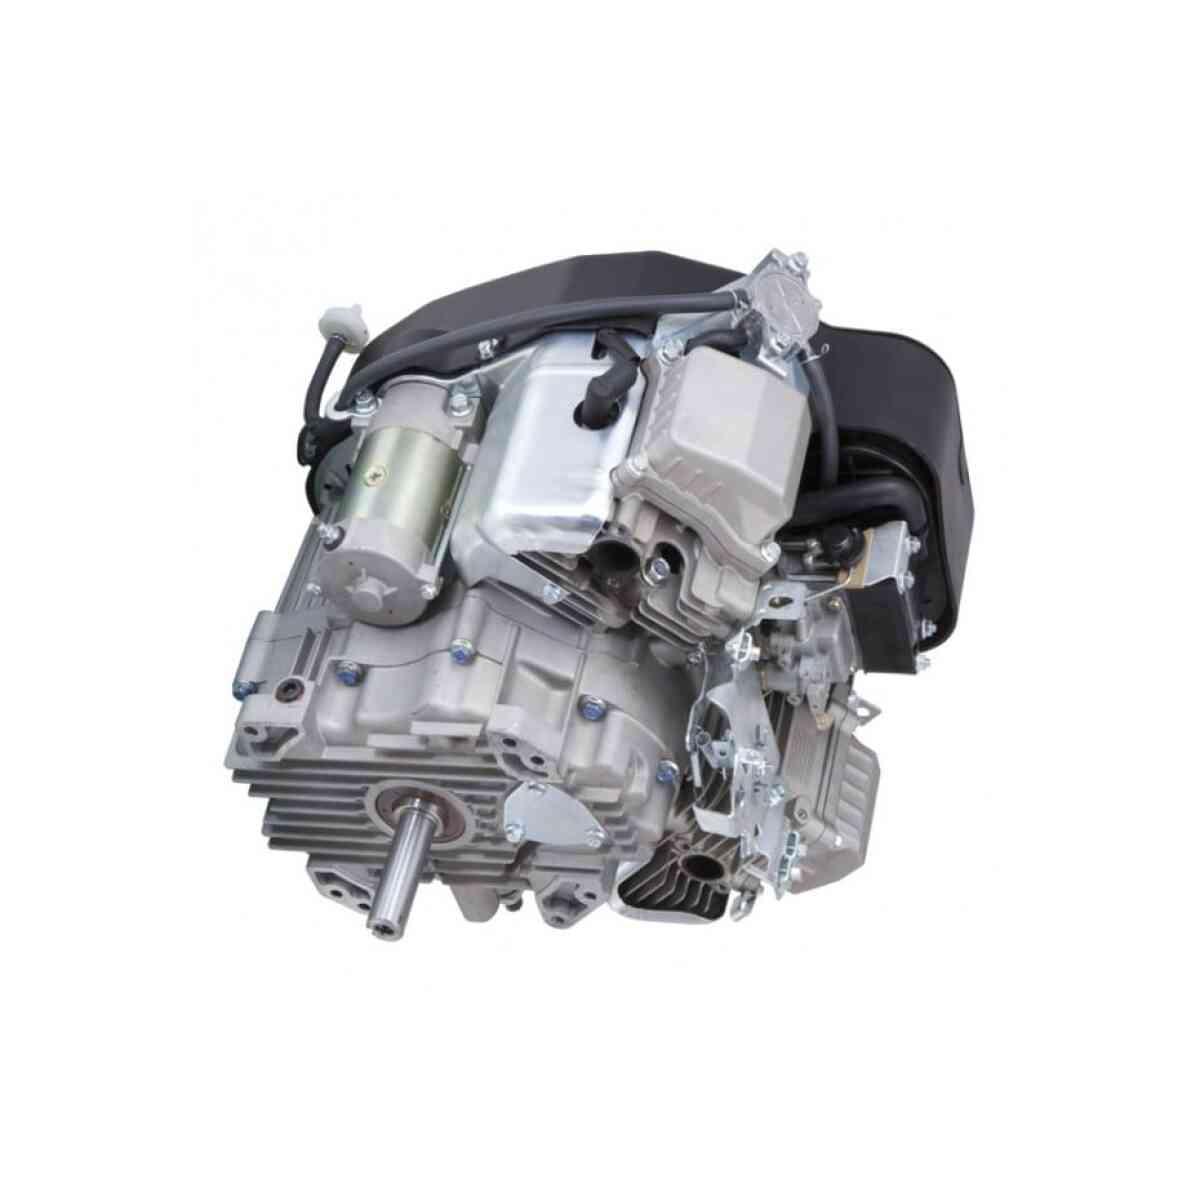 motor ax vertical v twin loncin 27cp a padure gardina.ro 73